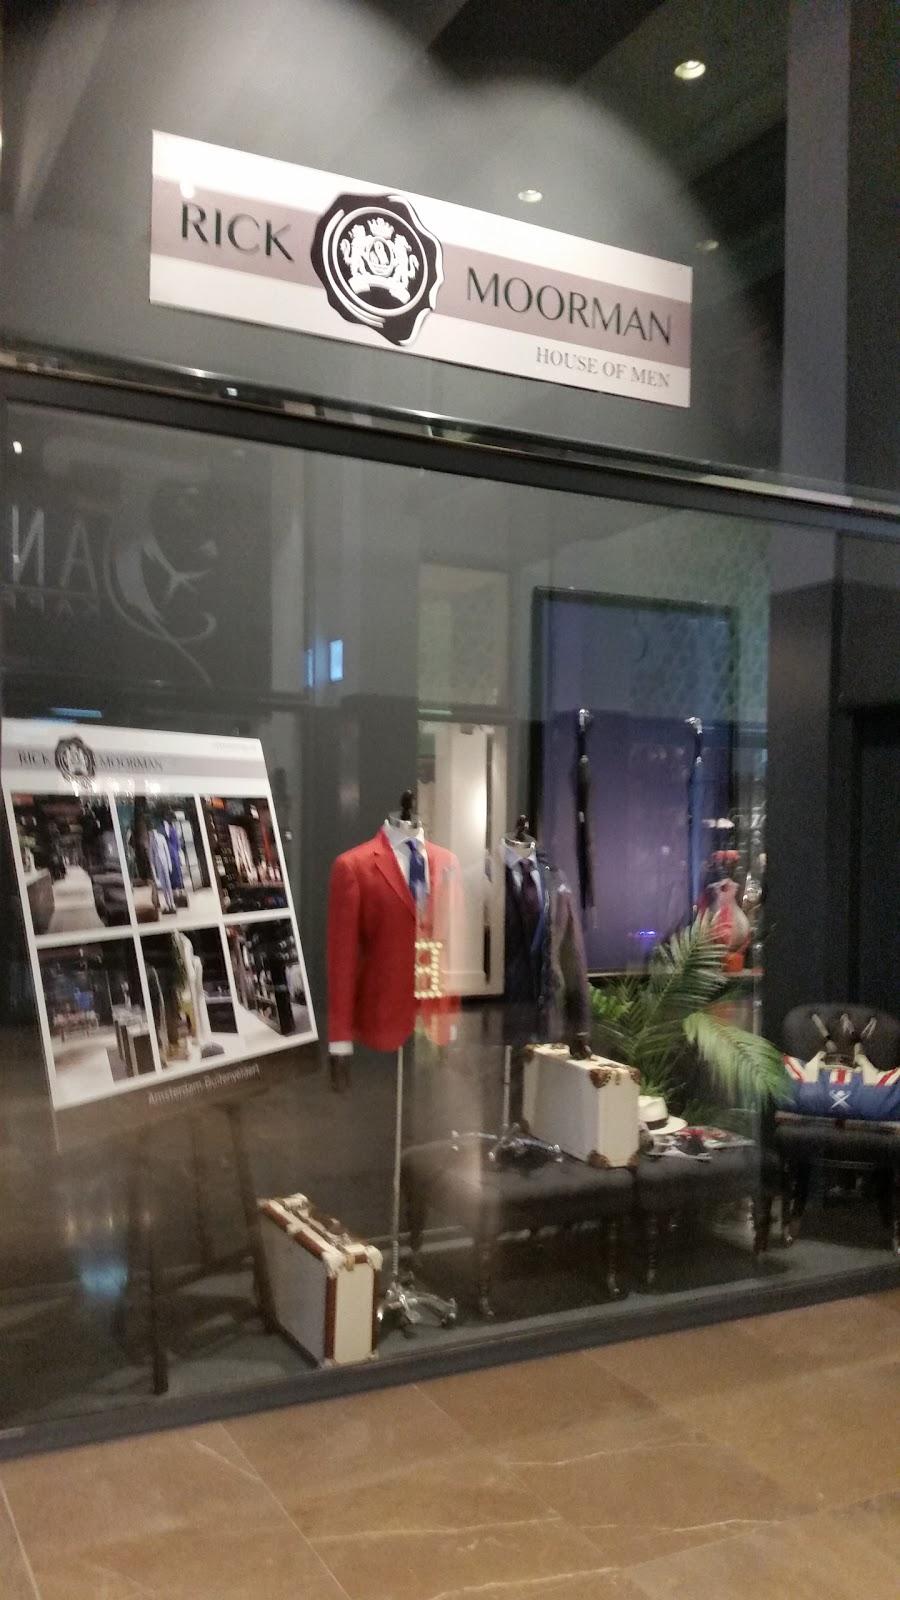 Moorman Mannen Mode Amsterdam accepteert American Express Credit Cards